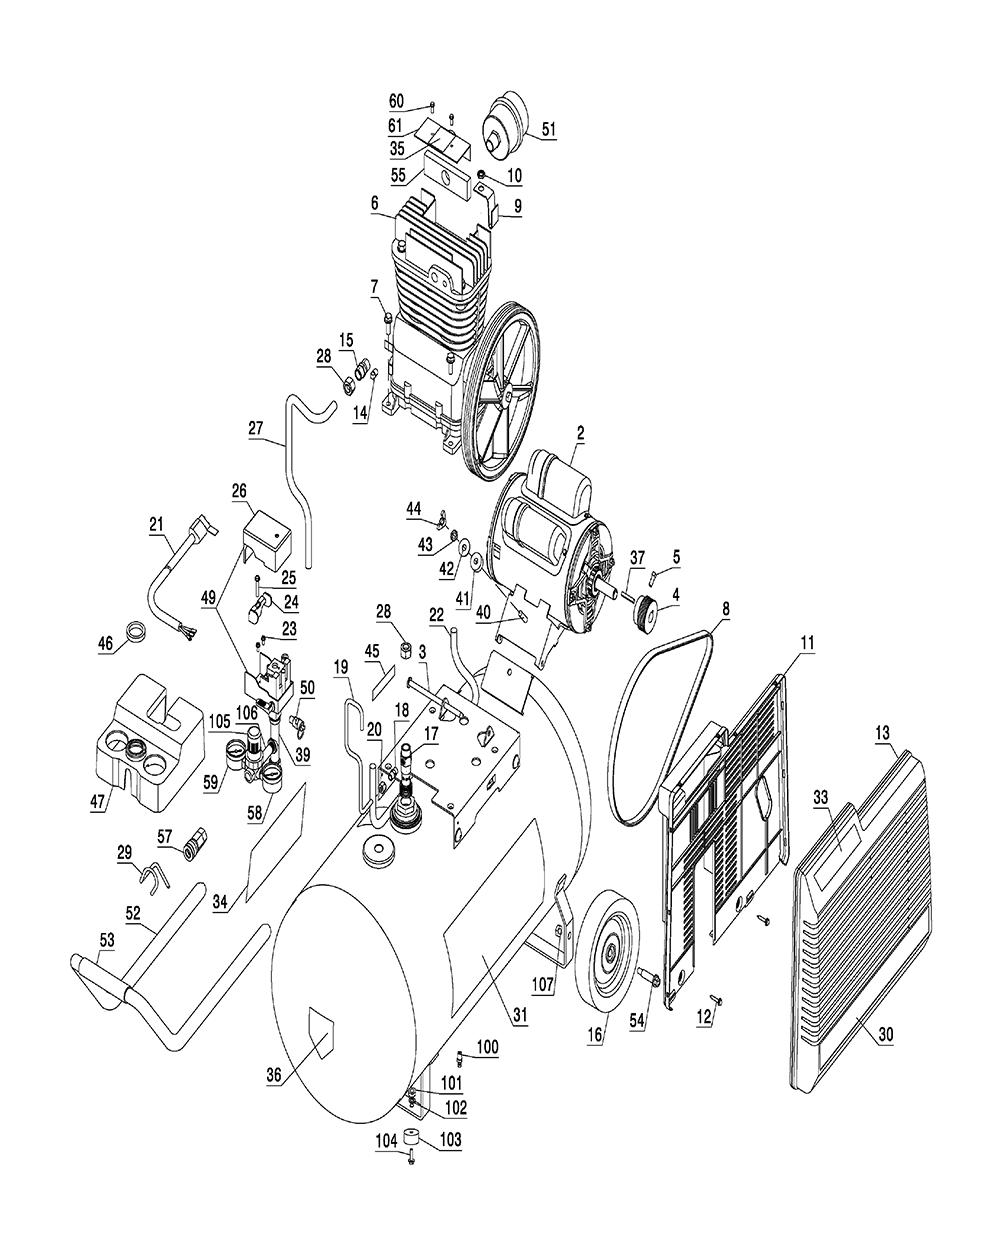 919-19541-BlackandDecker-T2-PB-1Break Down